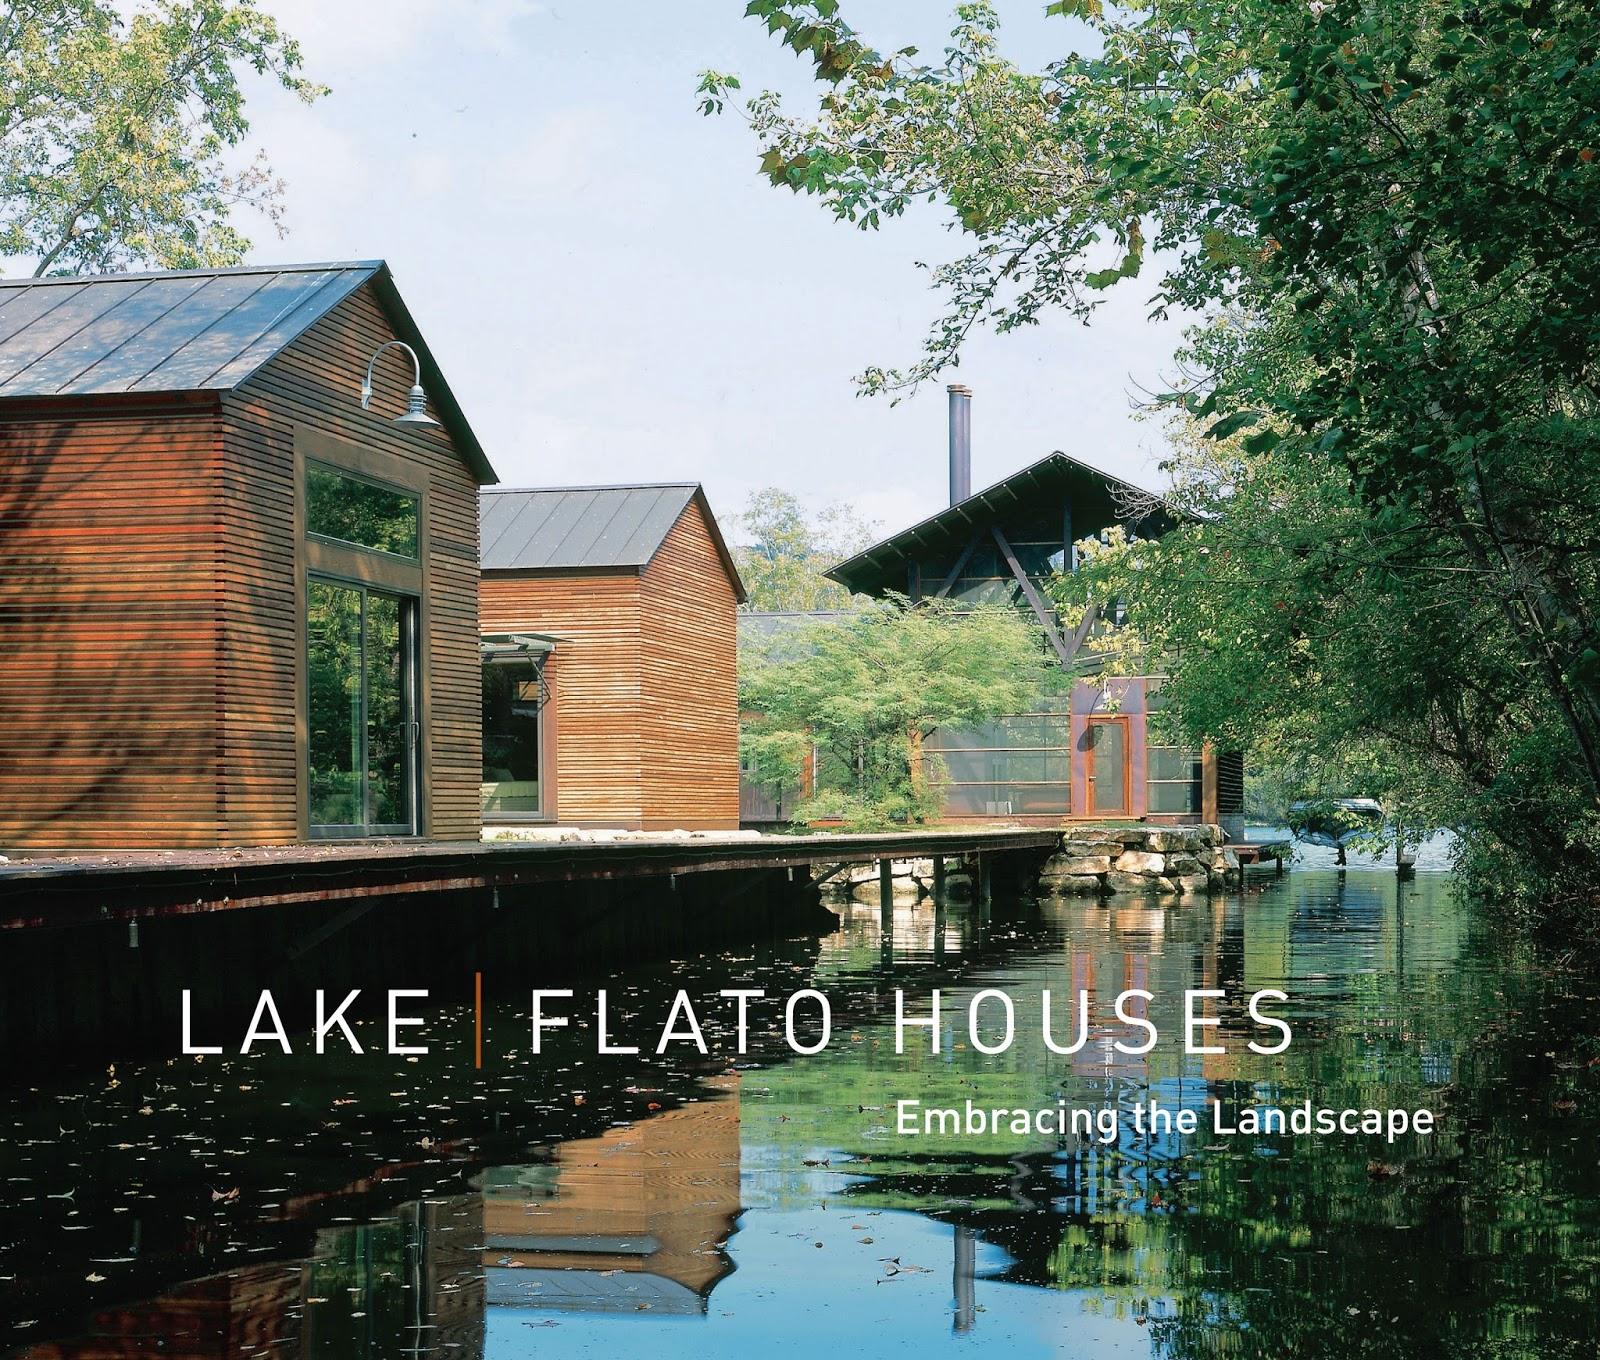 Utah Home Design Architects: University Of Texas Press: UT Press At The San Antonio